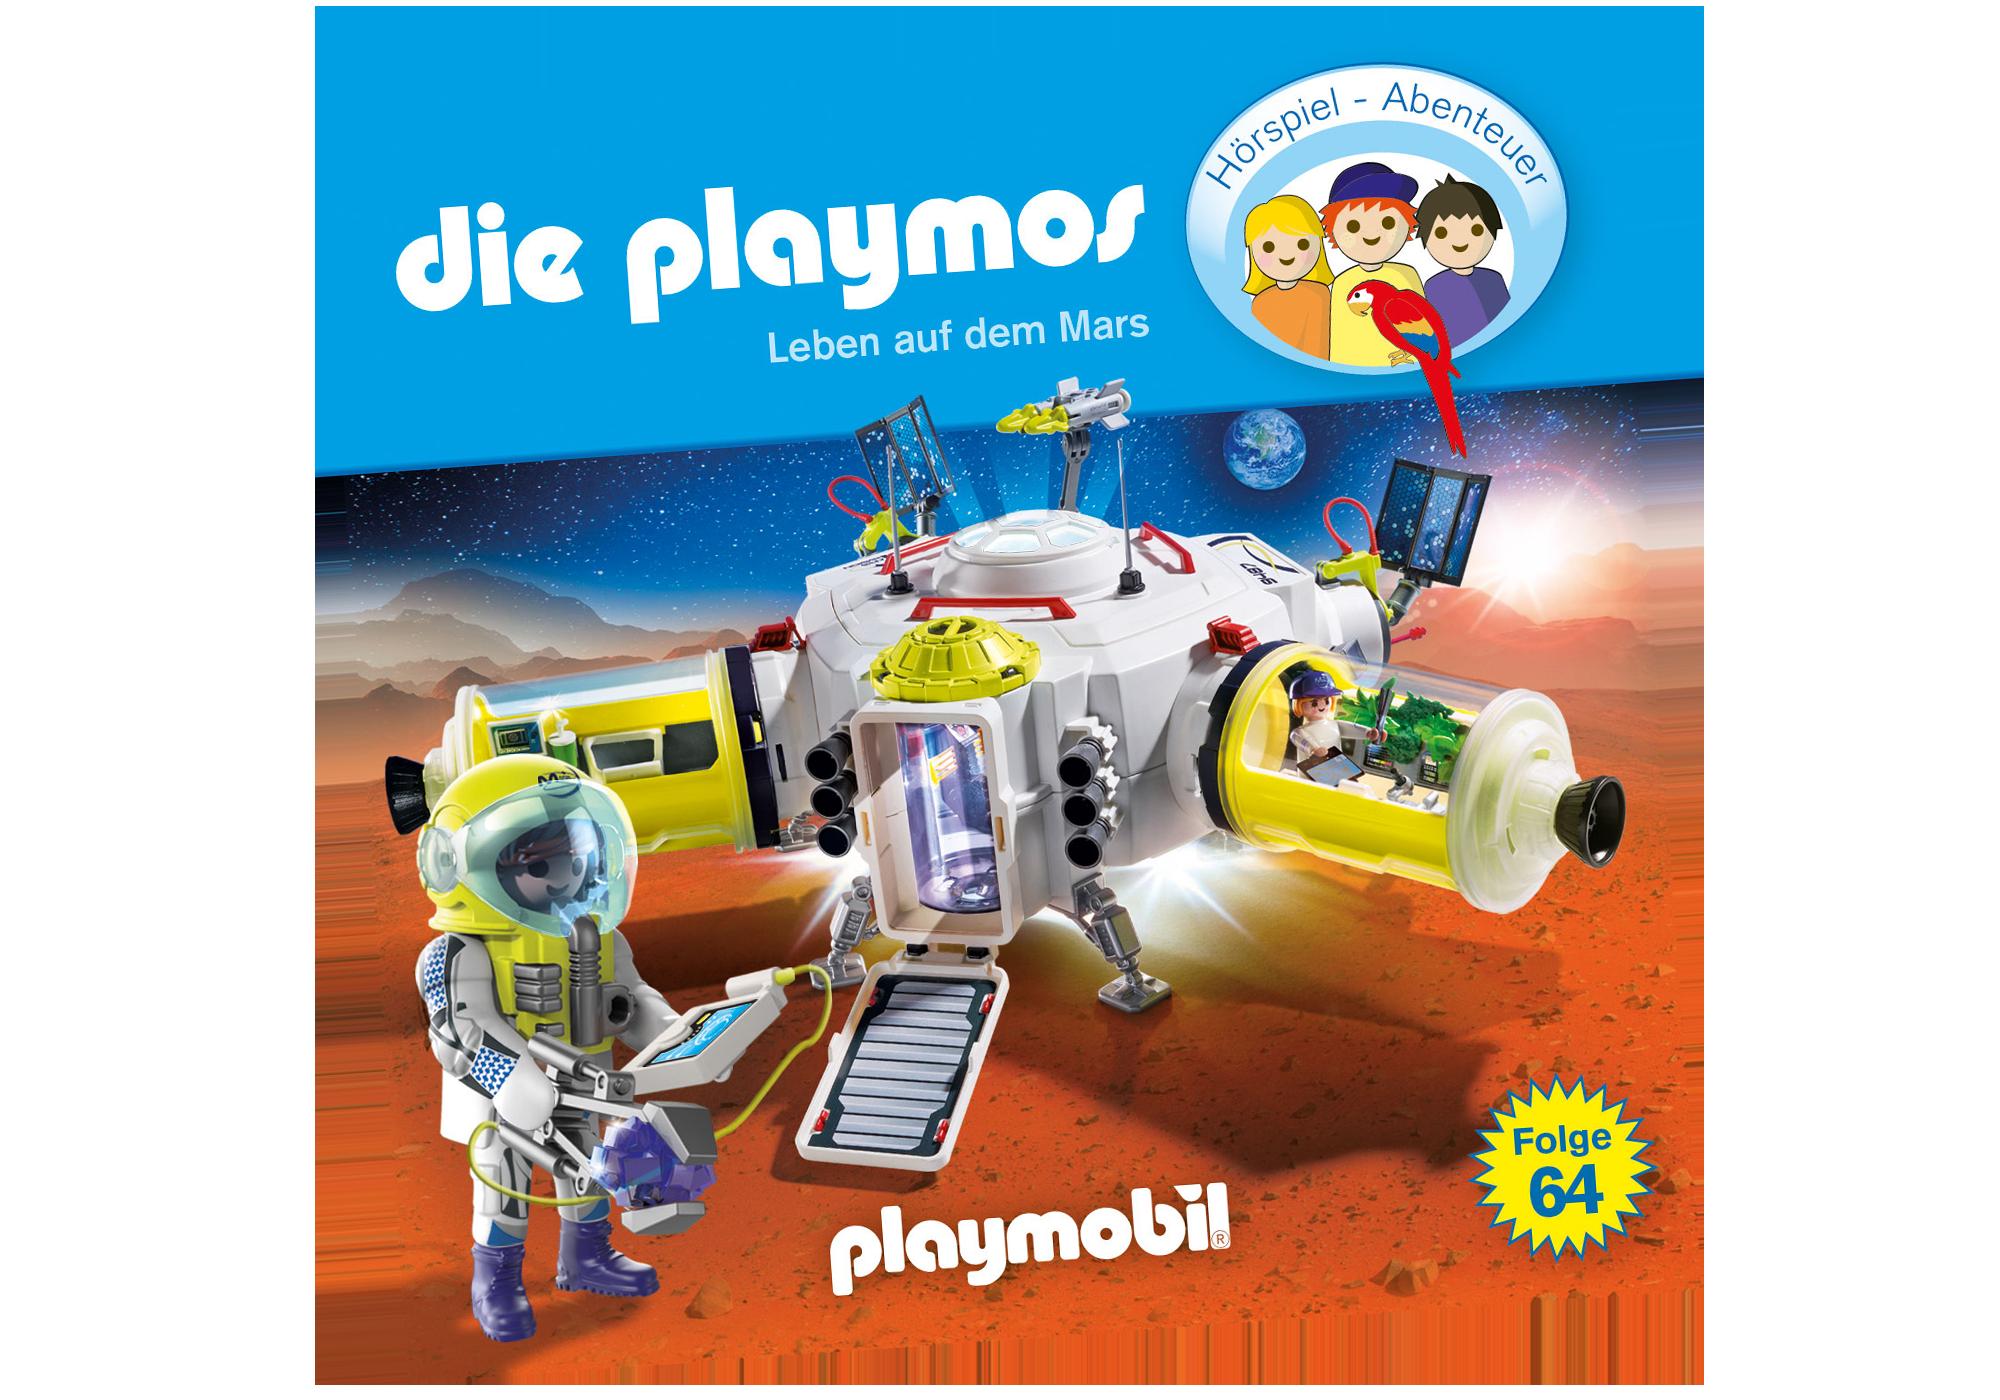 http://media.playmobil.com/i/playmobil/80086_product_detail/Leben auf dem Mars - Folge 64